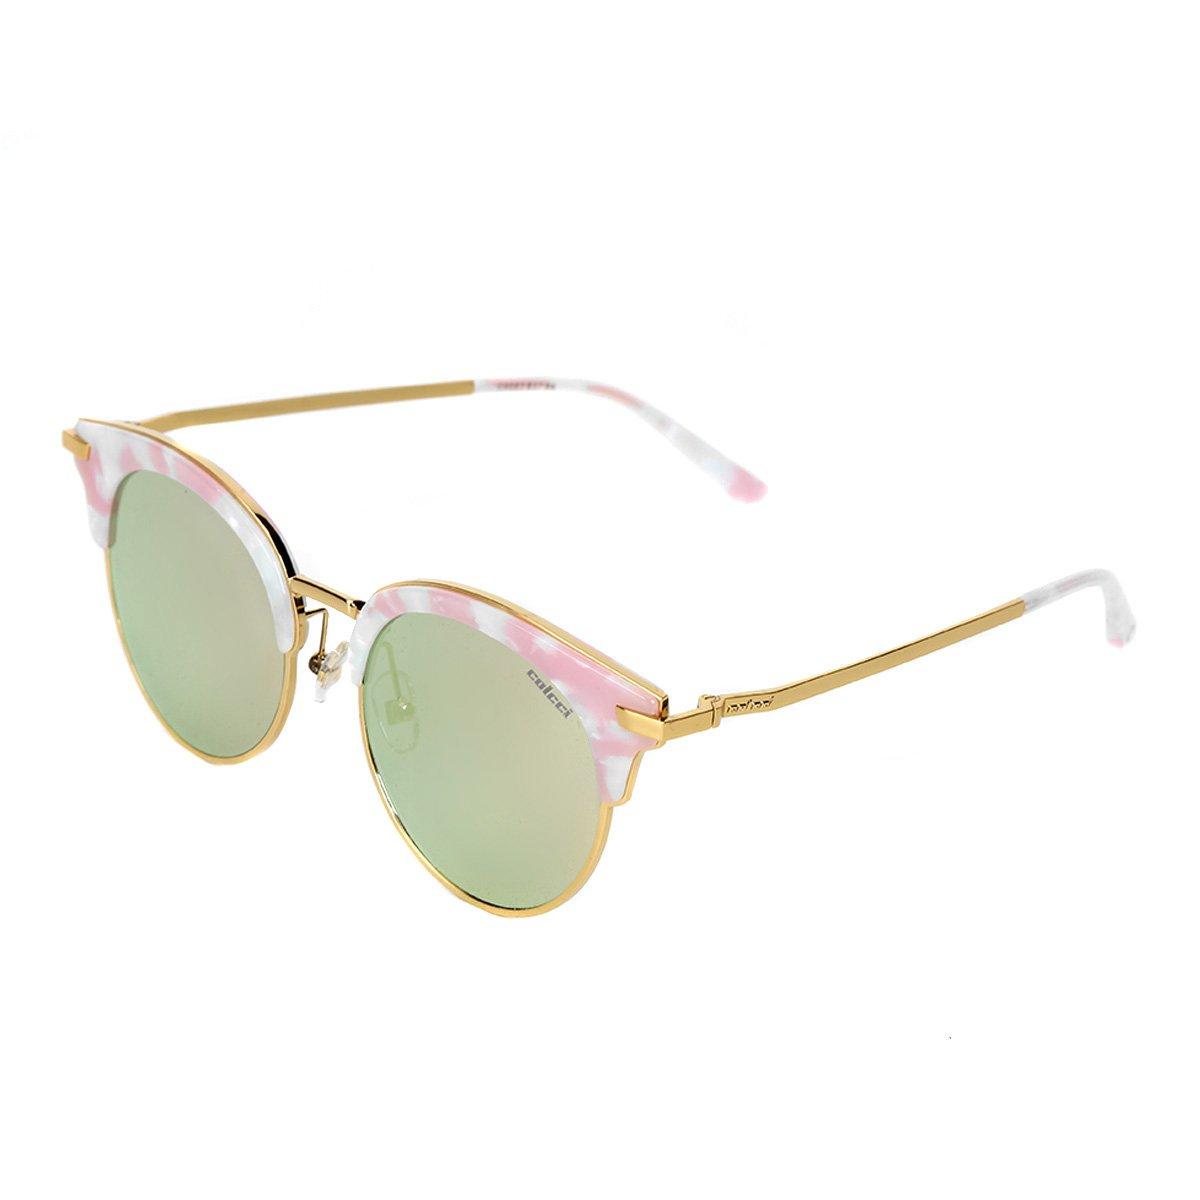 4252d802f Óculos de Sol Colcci Gatinho Brilho Feminino - Nude | Zattini